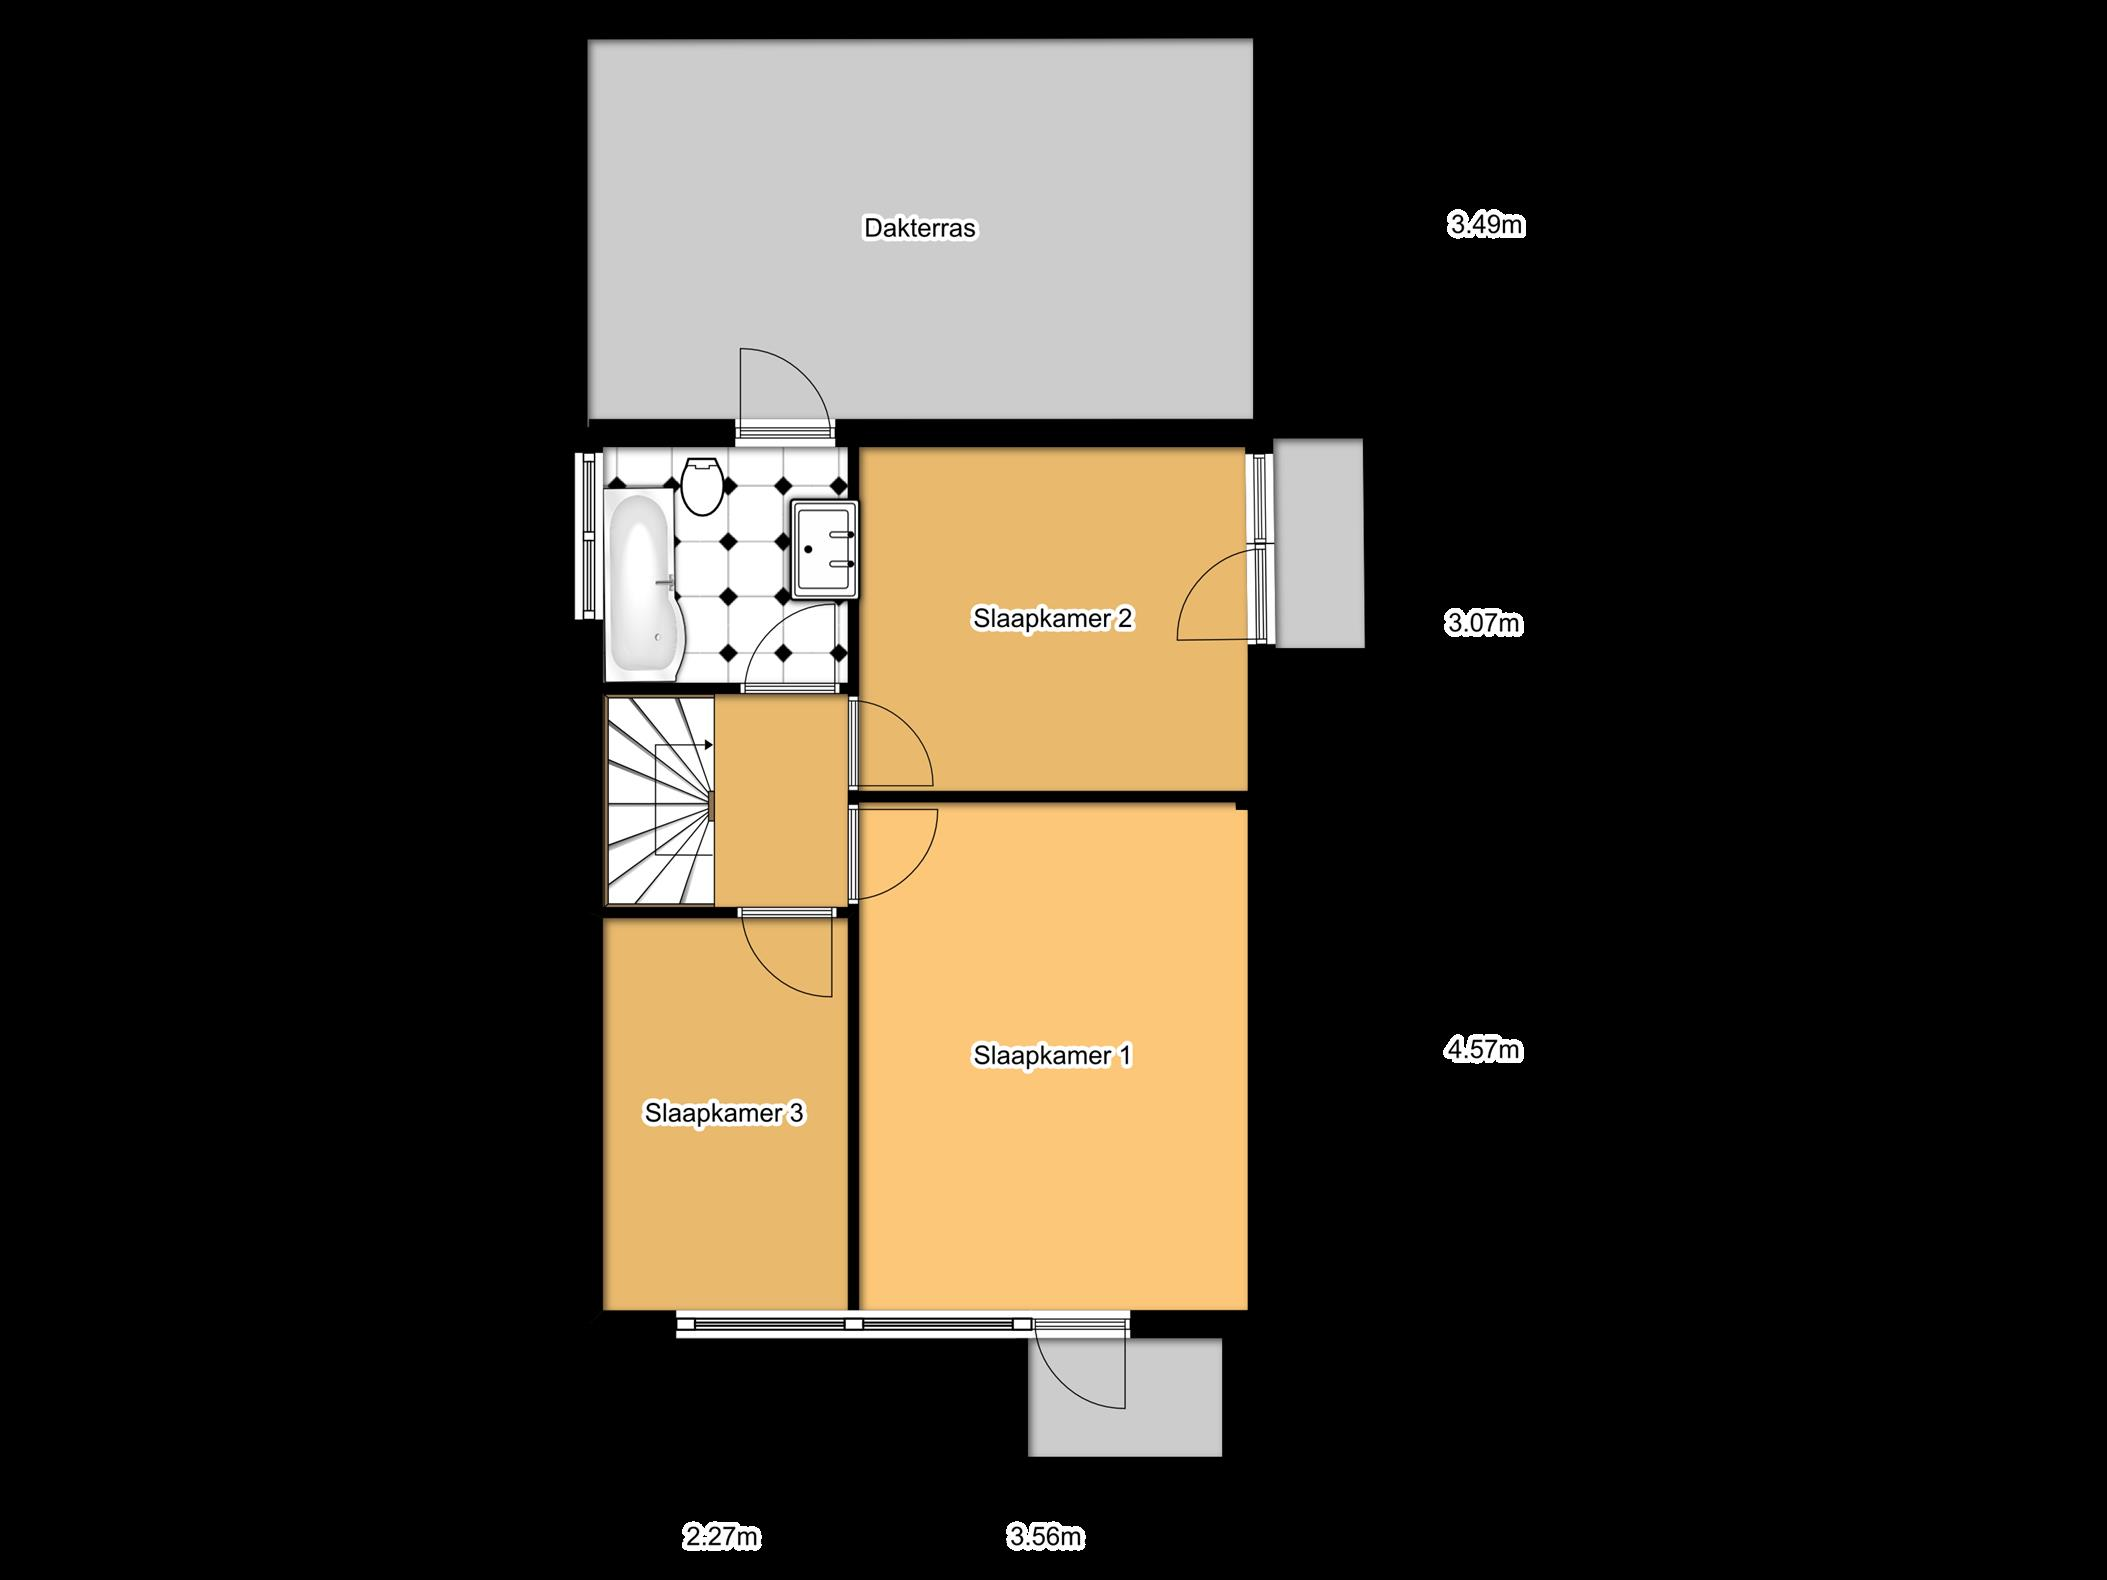 Woonhuis te koop bergerstraat 61 maastricht - Model betegelde badkamer ...